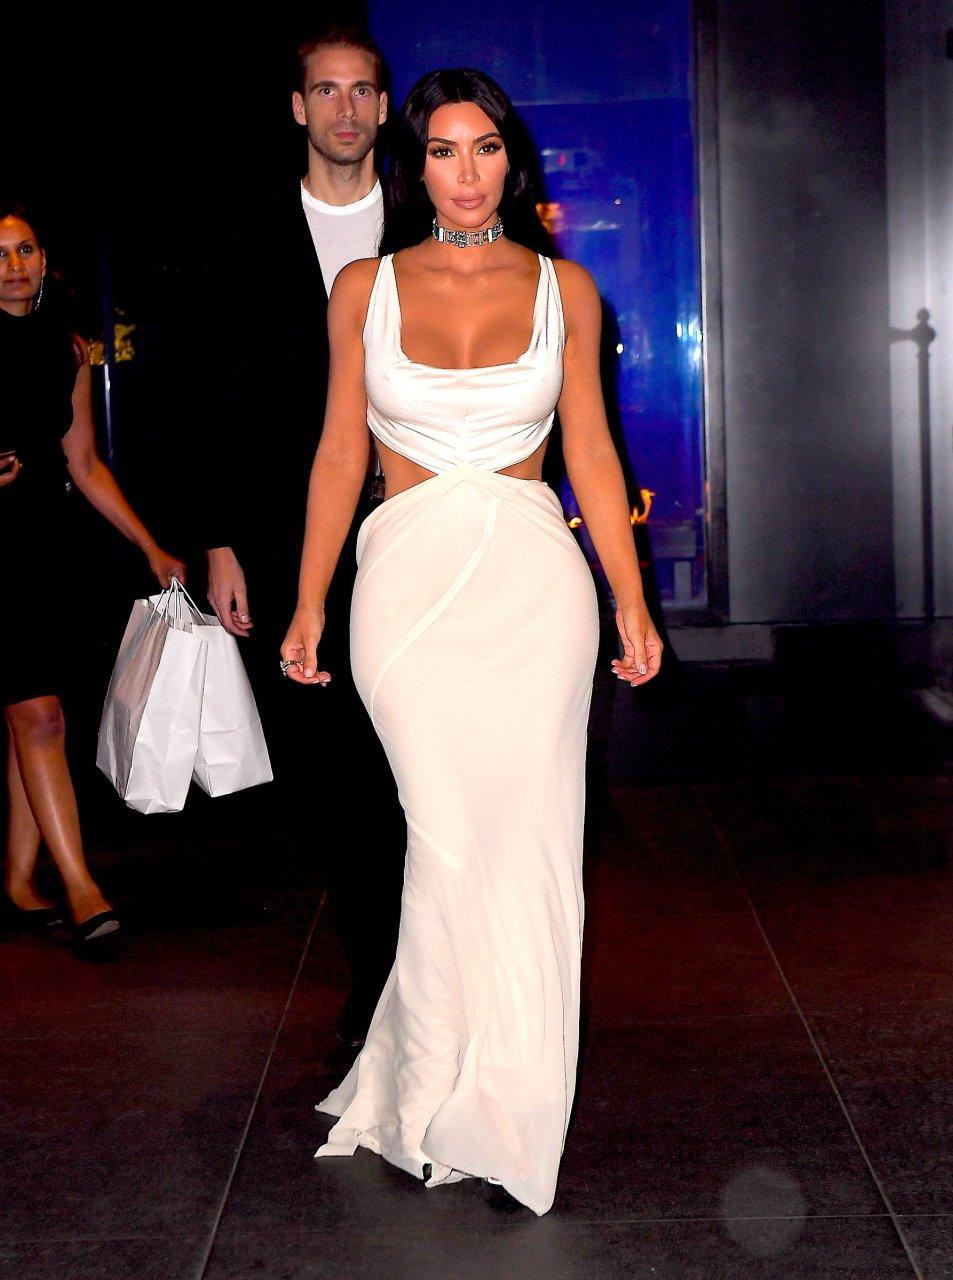 Kim-Kardashian-Sexy-TheFappeningBlog.com-27.jpg